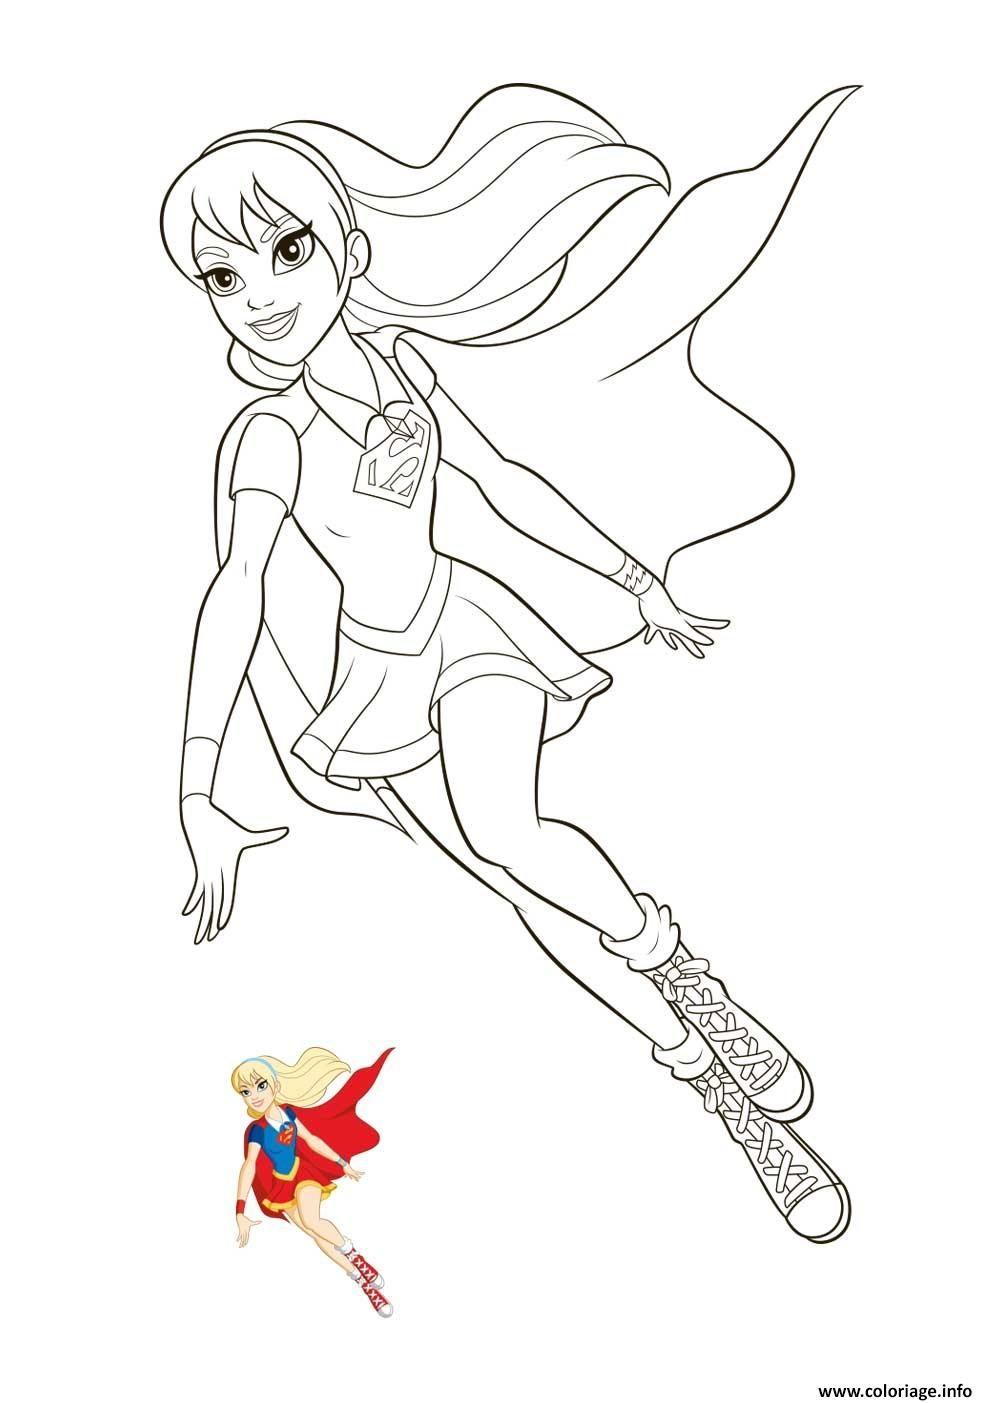 Coloriage Supergirl Super Hero Girls A Imprimer Coloriage Super Heros Coloriage Coloriage Ladybug